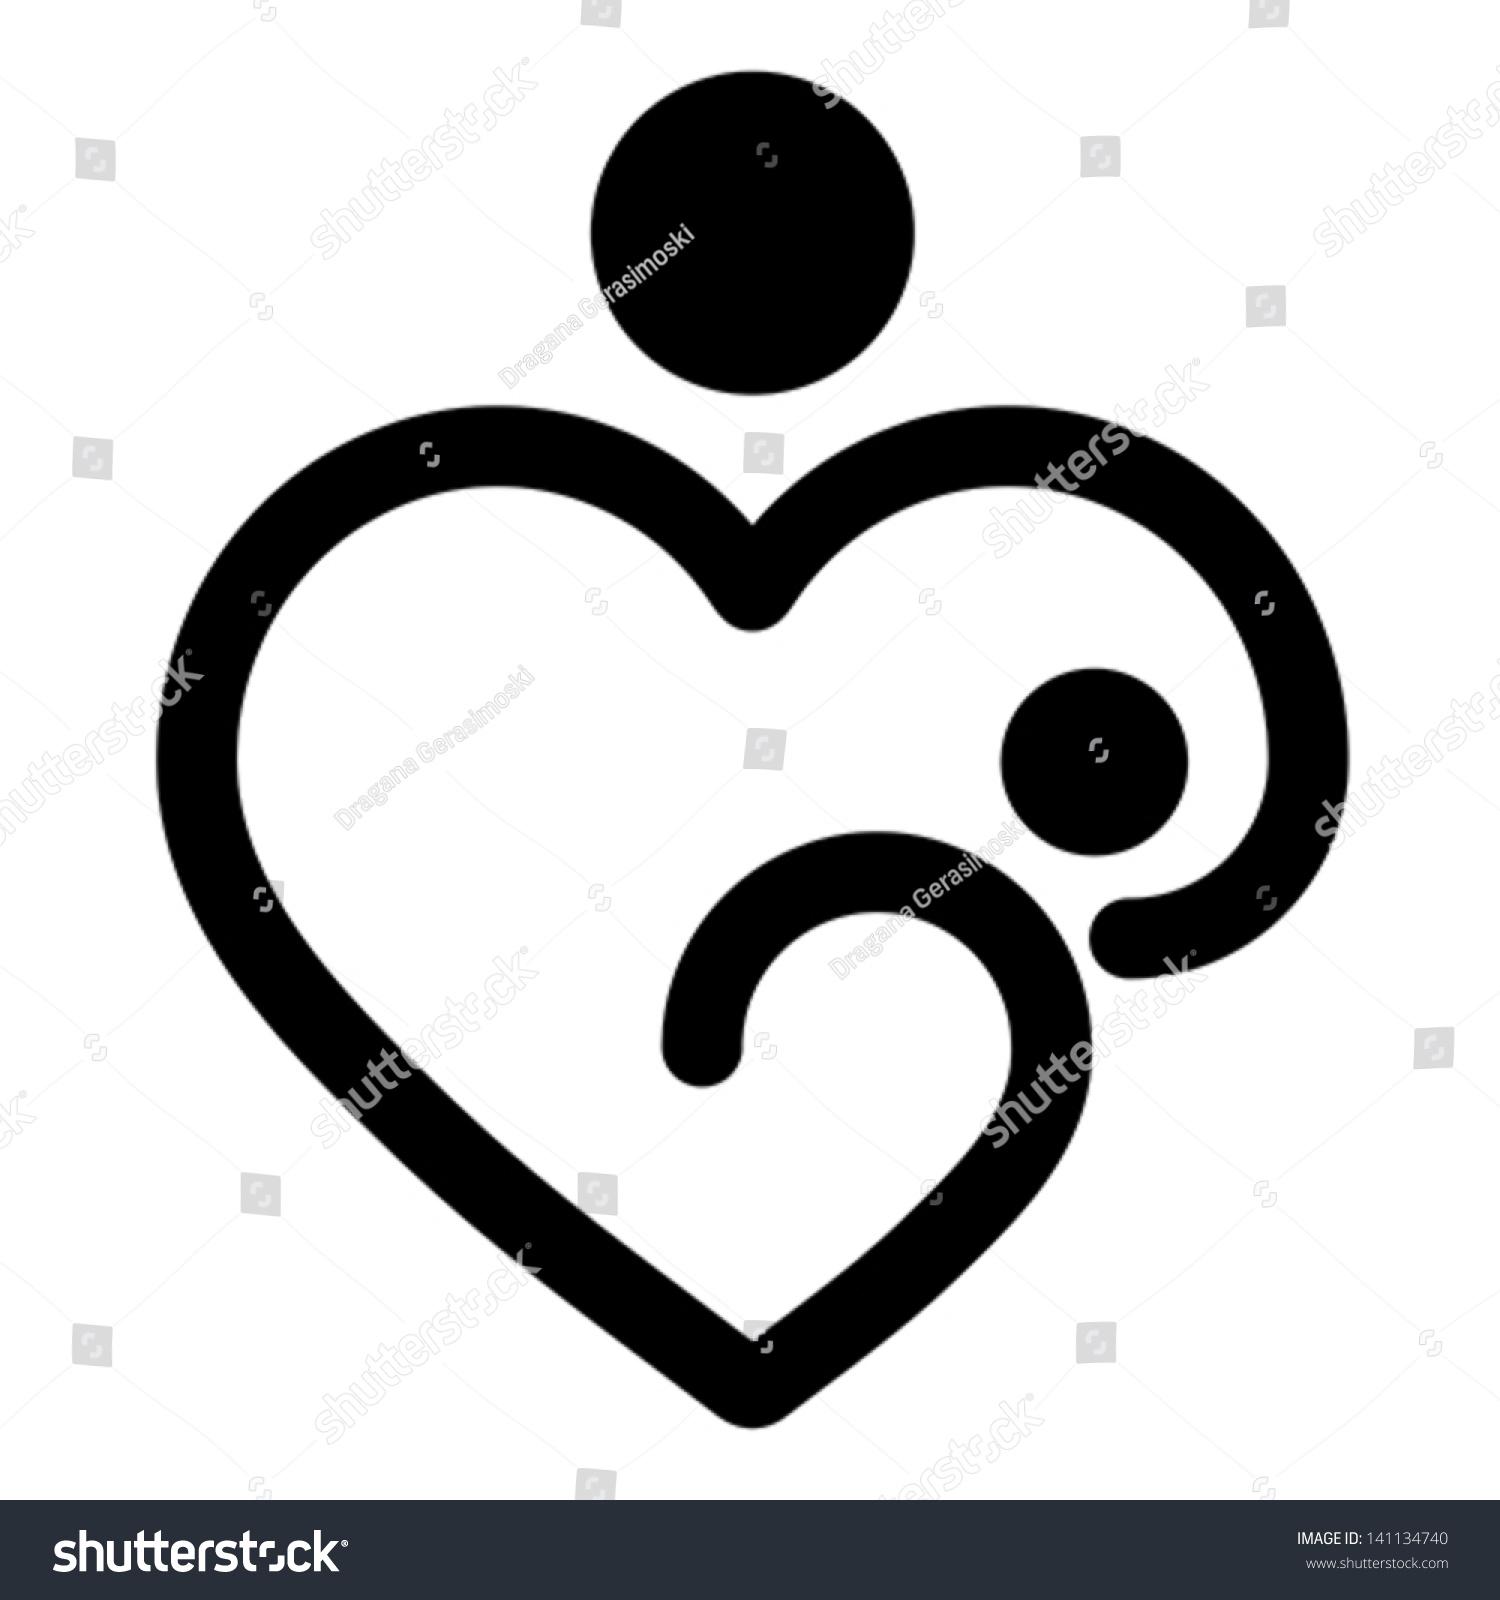 Breastfeeding heart symbol view symbol biocorpaavc